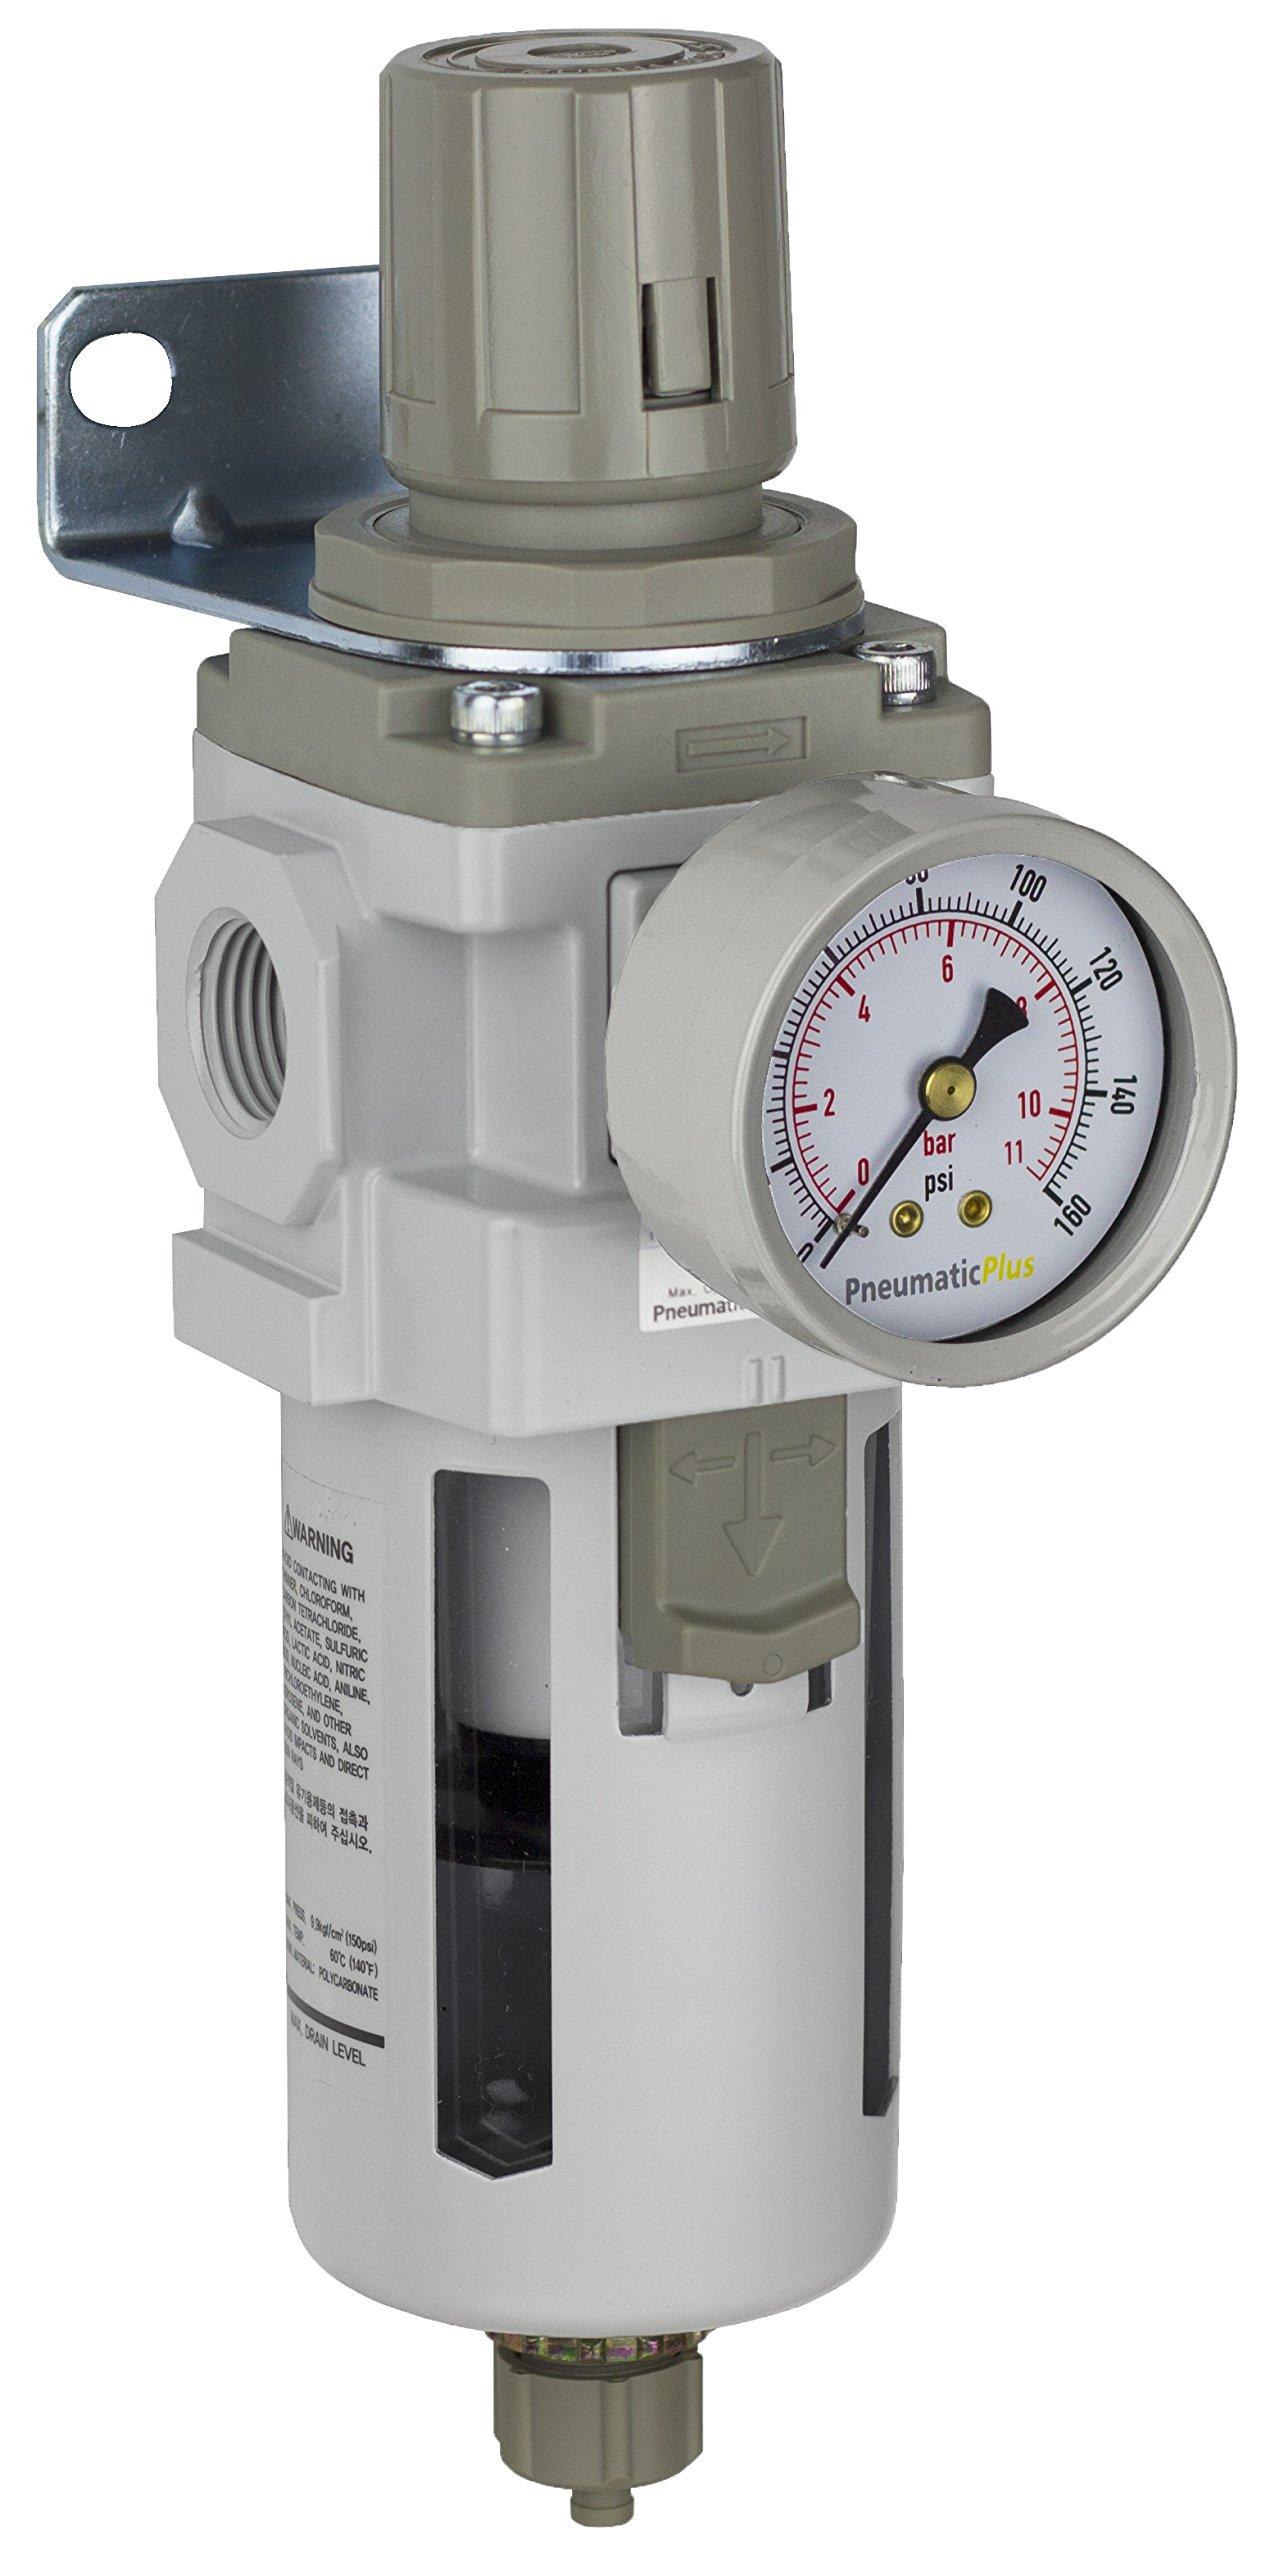 PneumaticPlus SAW400-N04BG Compressed Air Filter Regulator Piggyback Combo 1/2'' NPT - Poly Bowl, Manual Drain, Bracket, Gauge by PneumaticPlus